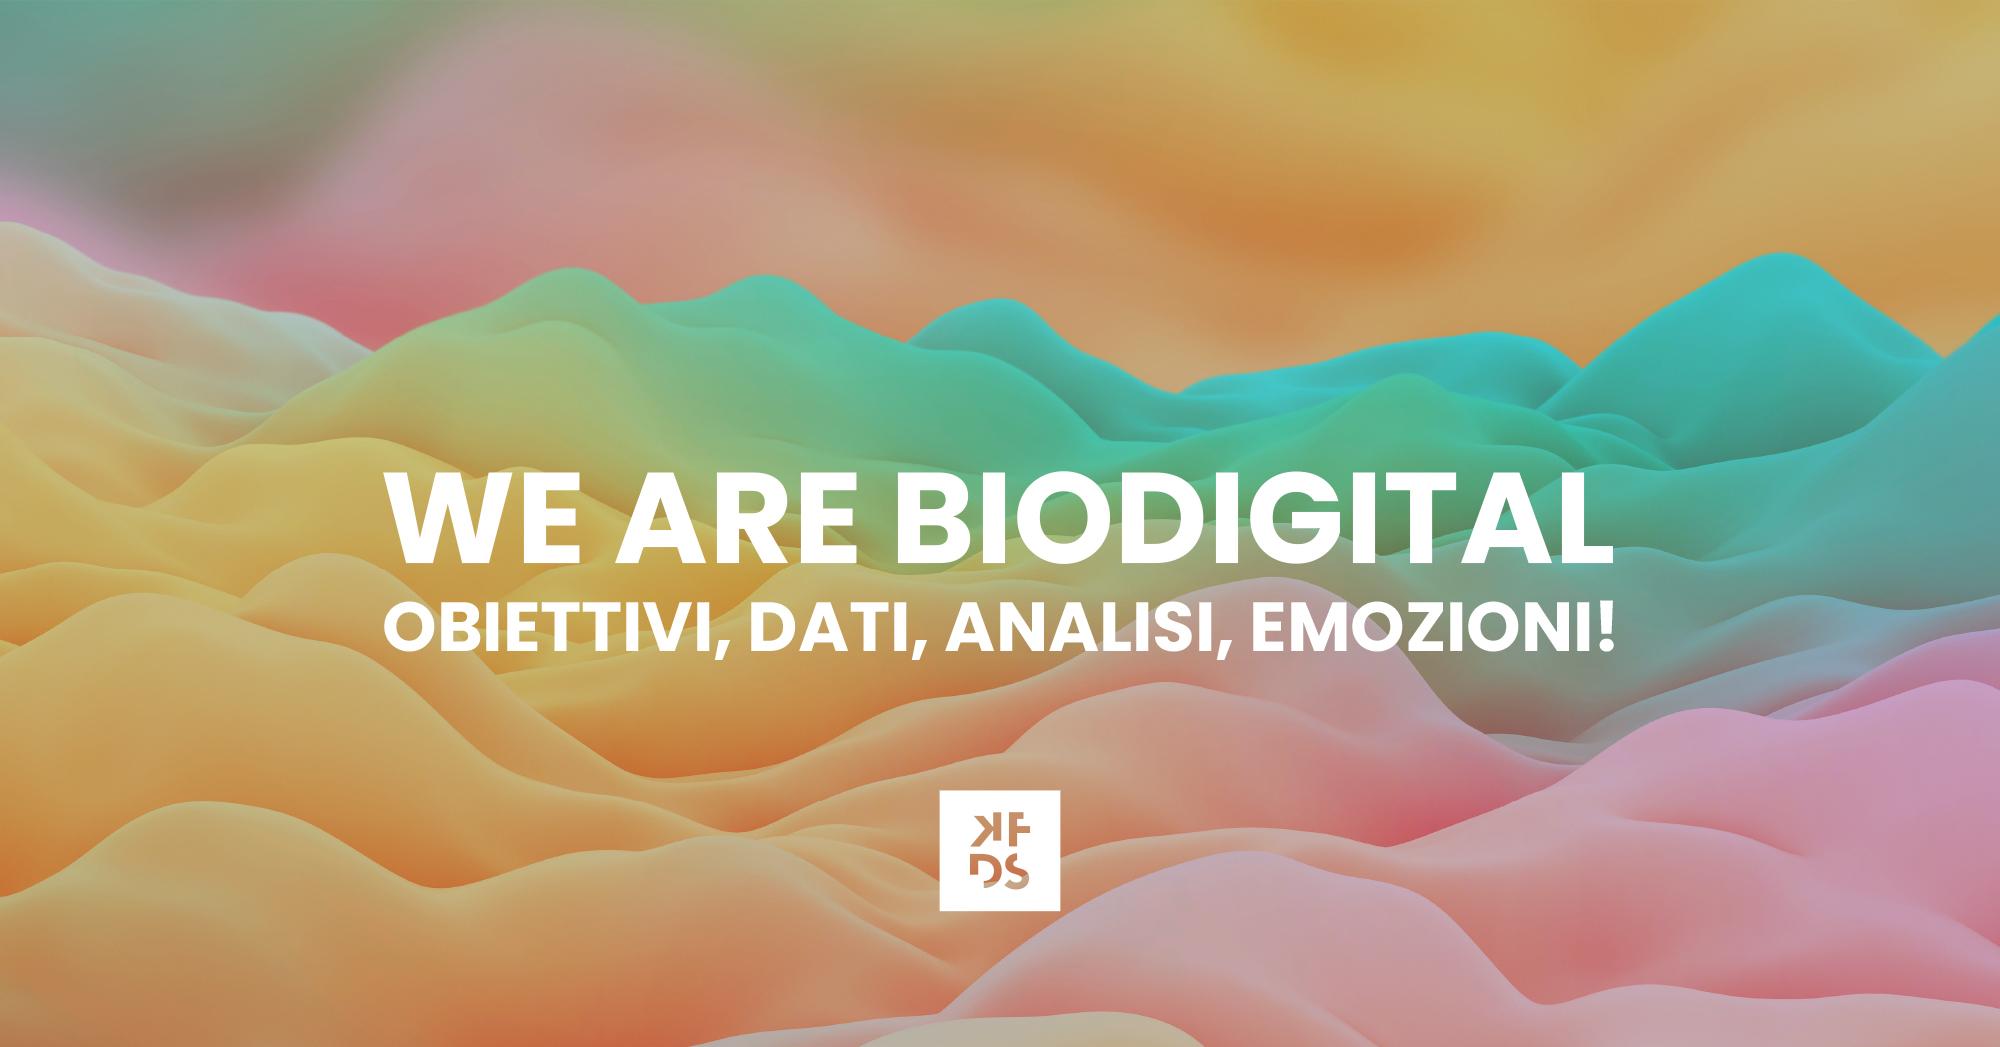 we are biodigital